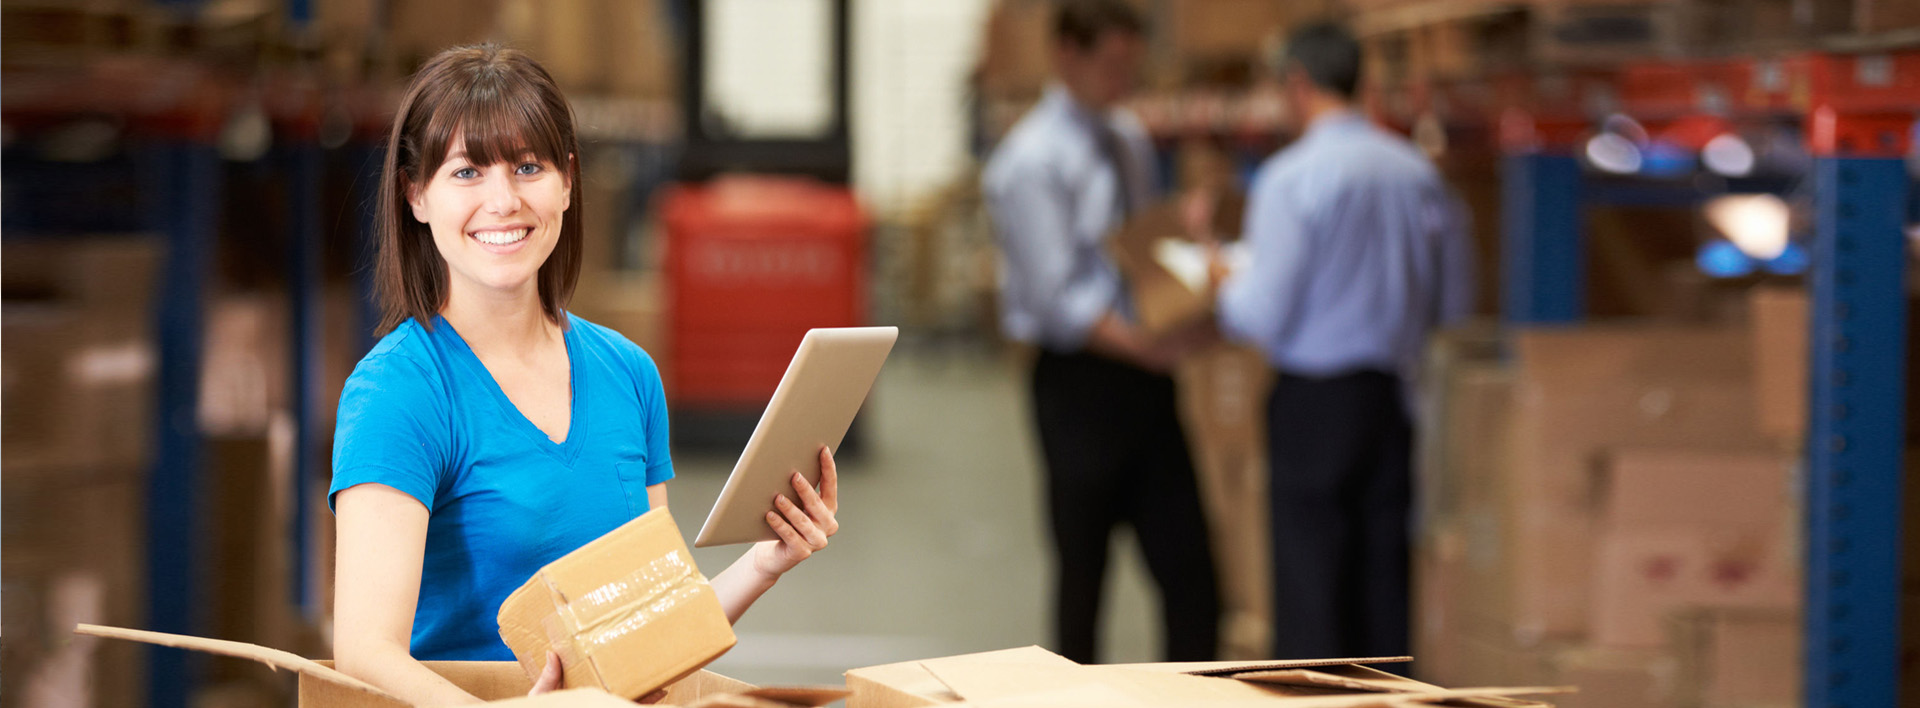 сервис складских услуг в Китае США Европе